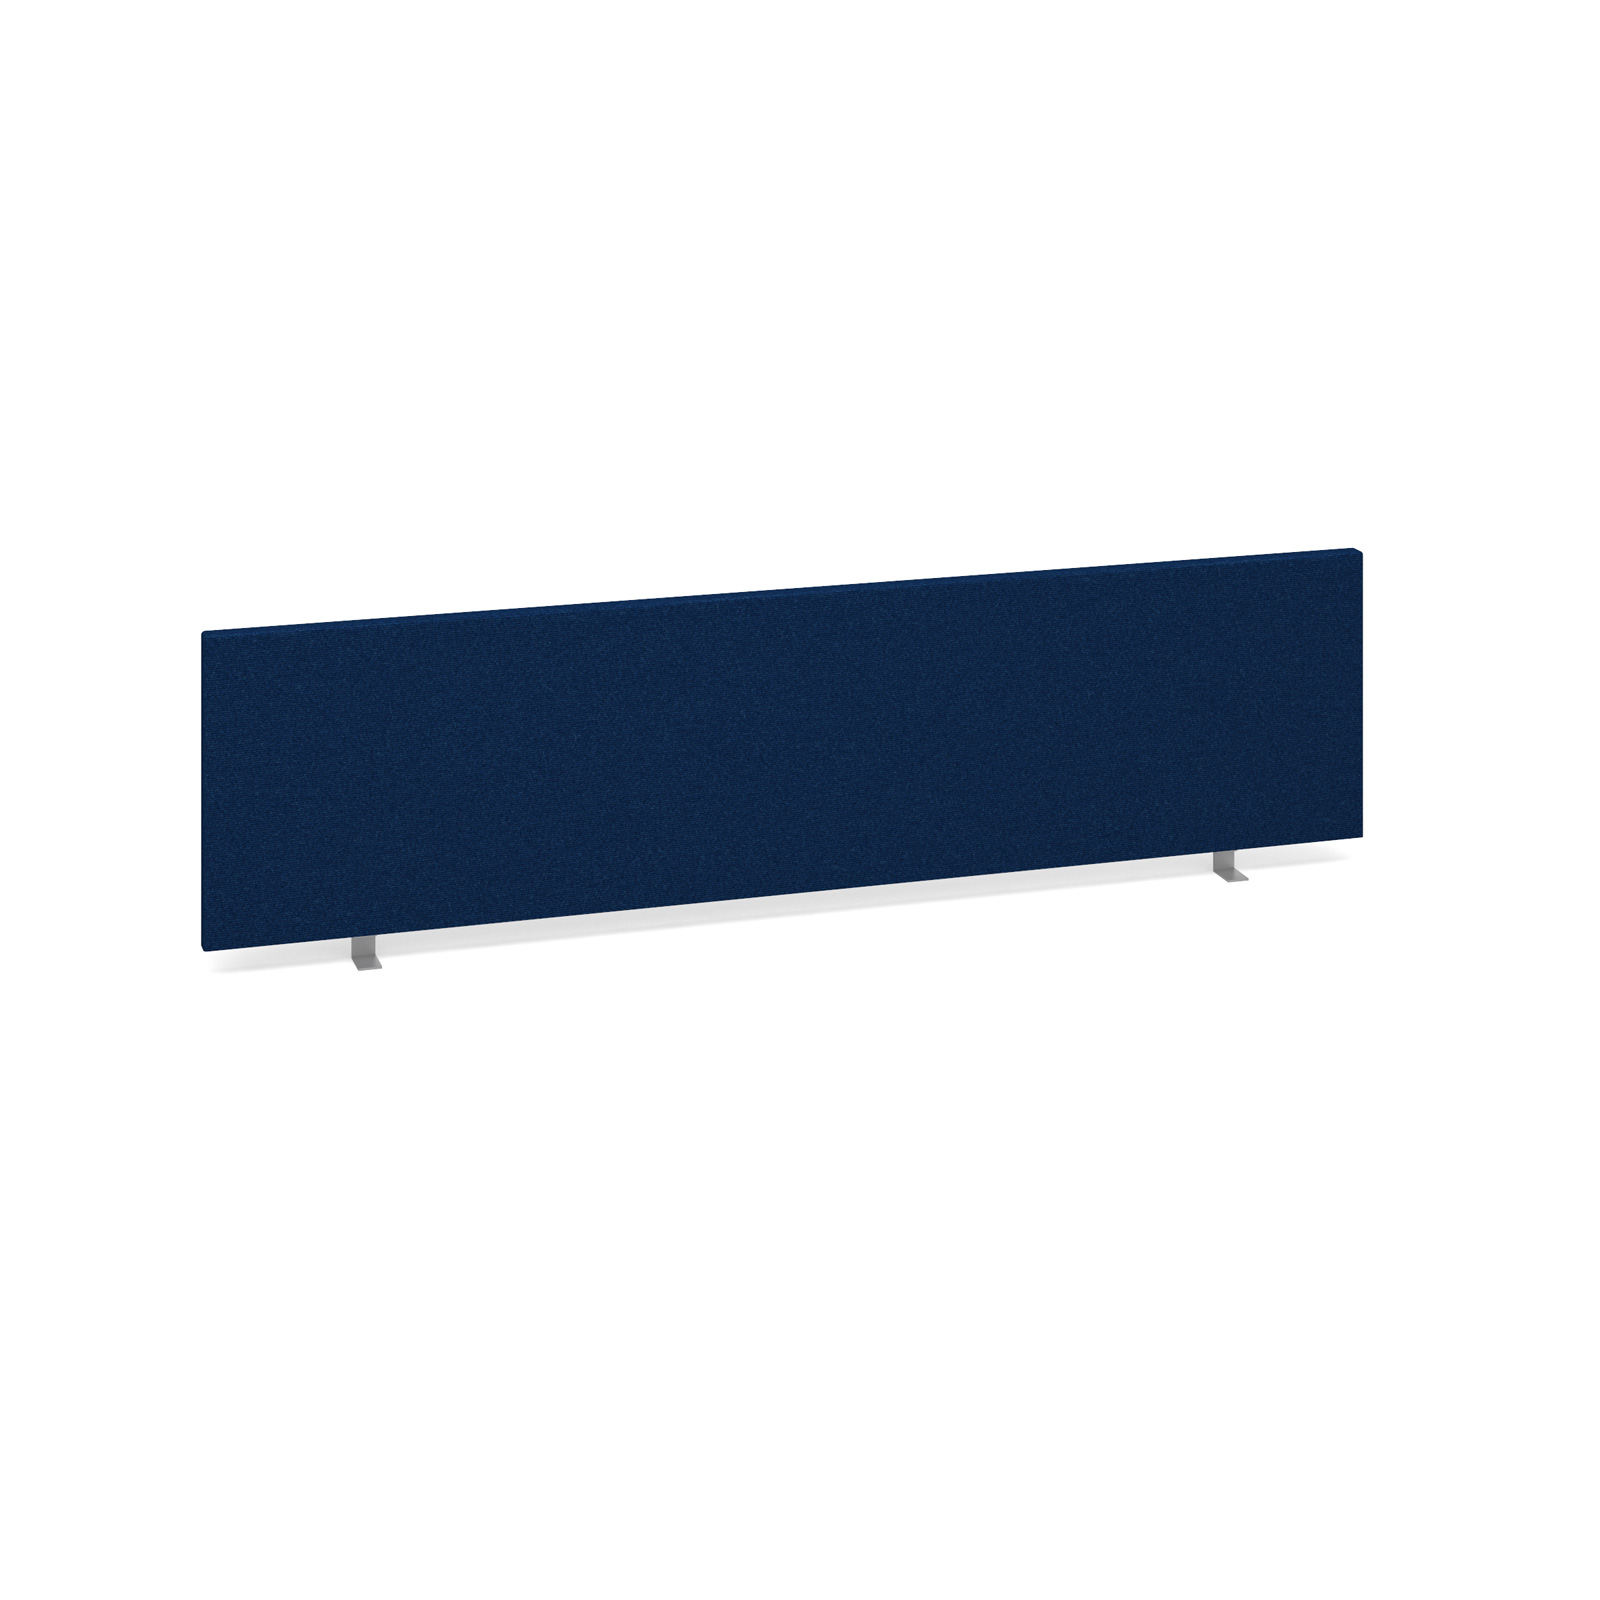 Straight Tops Straight desktop fabric screen 1600mm x 400mm - blue